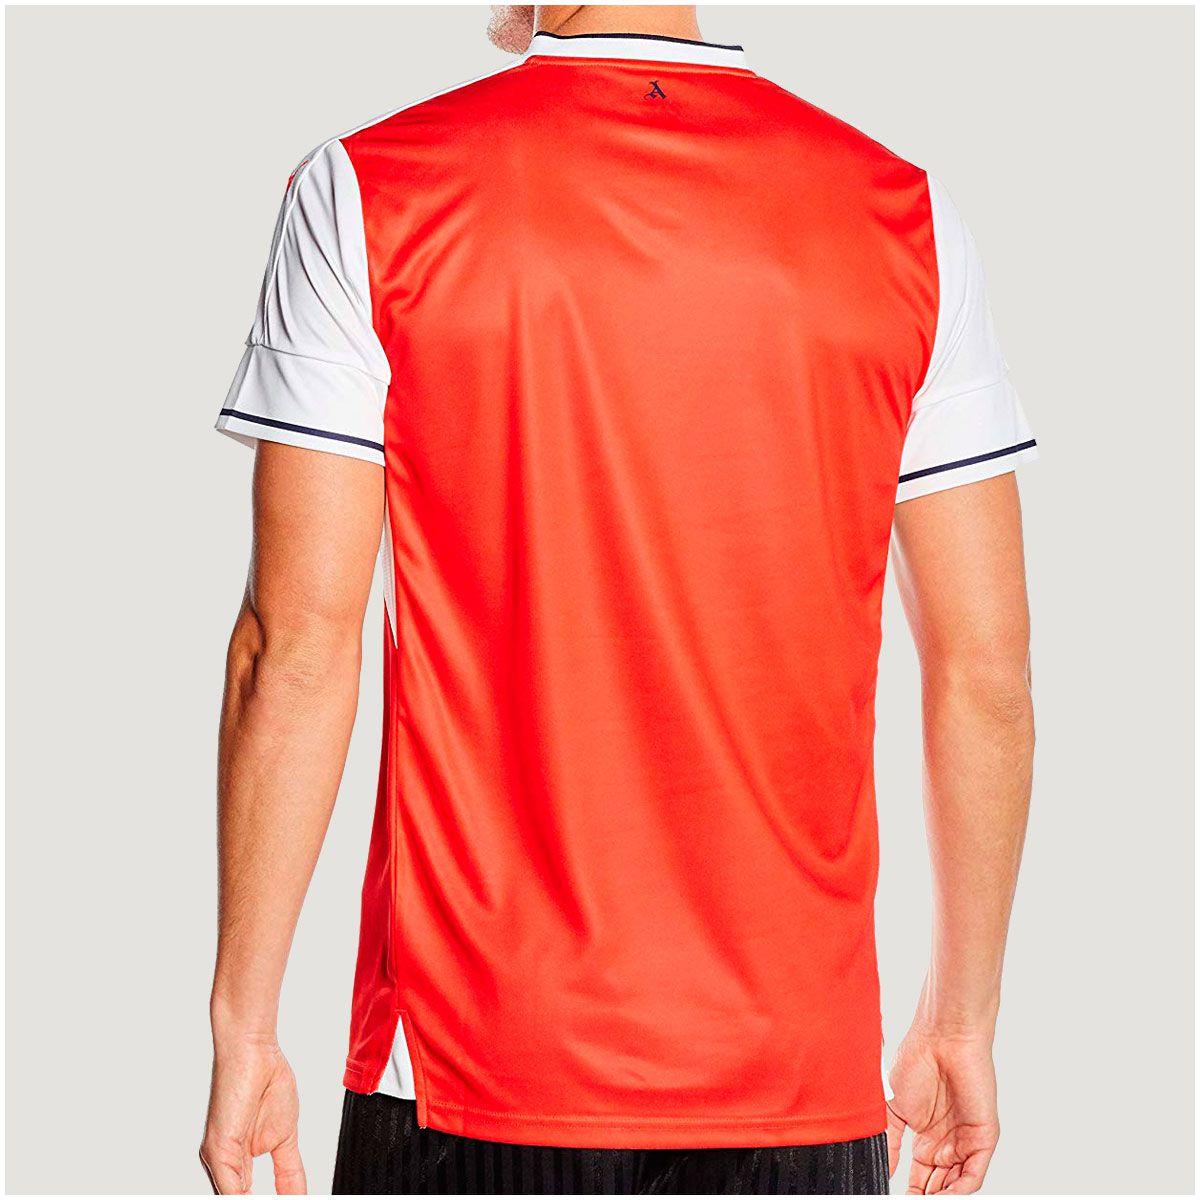 Camisa Arsenal Home Puma 2016